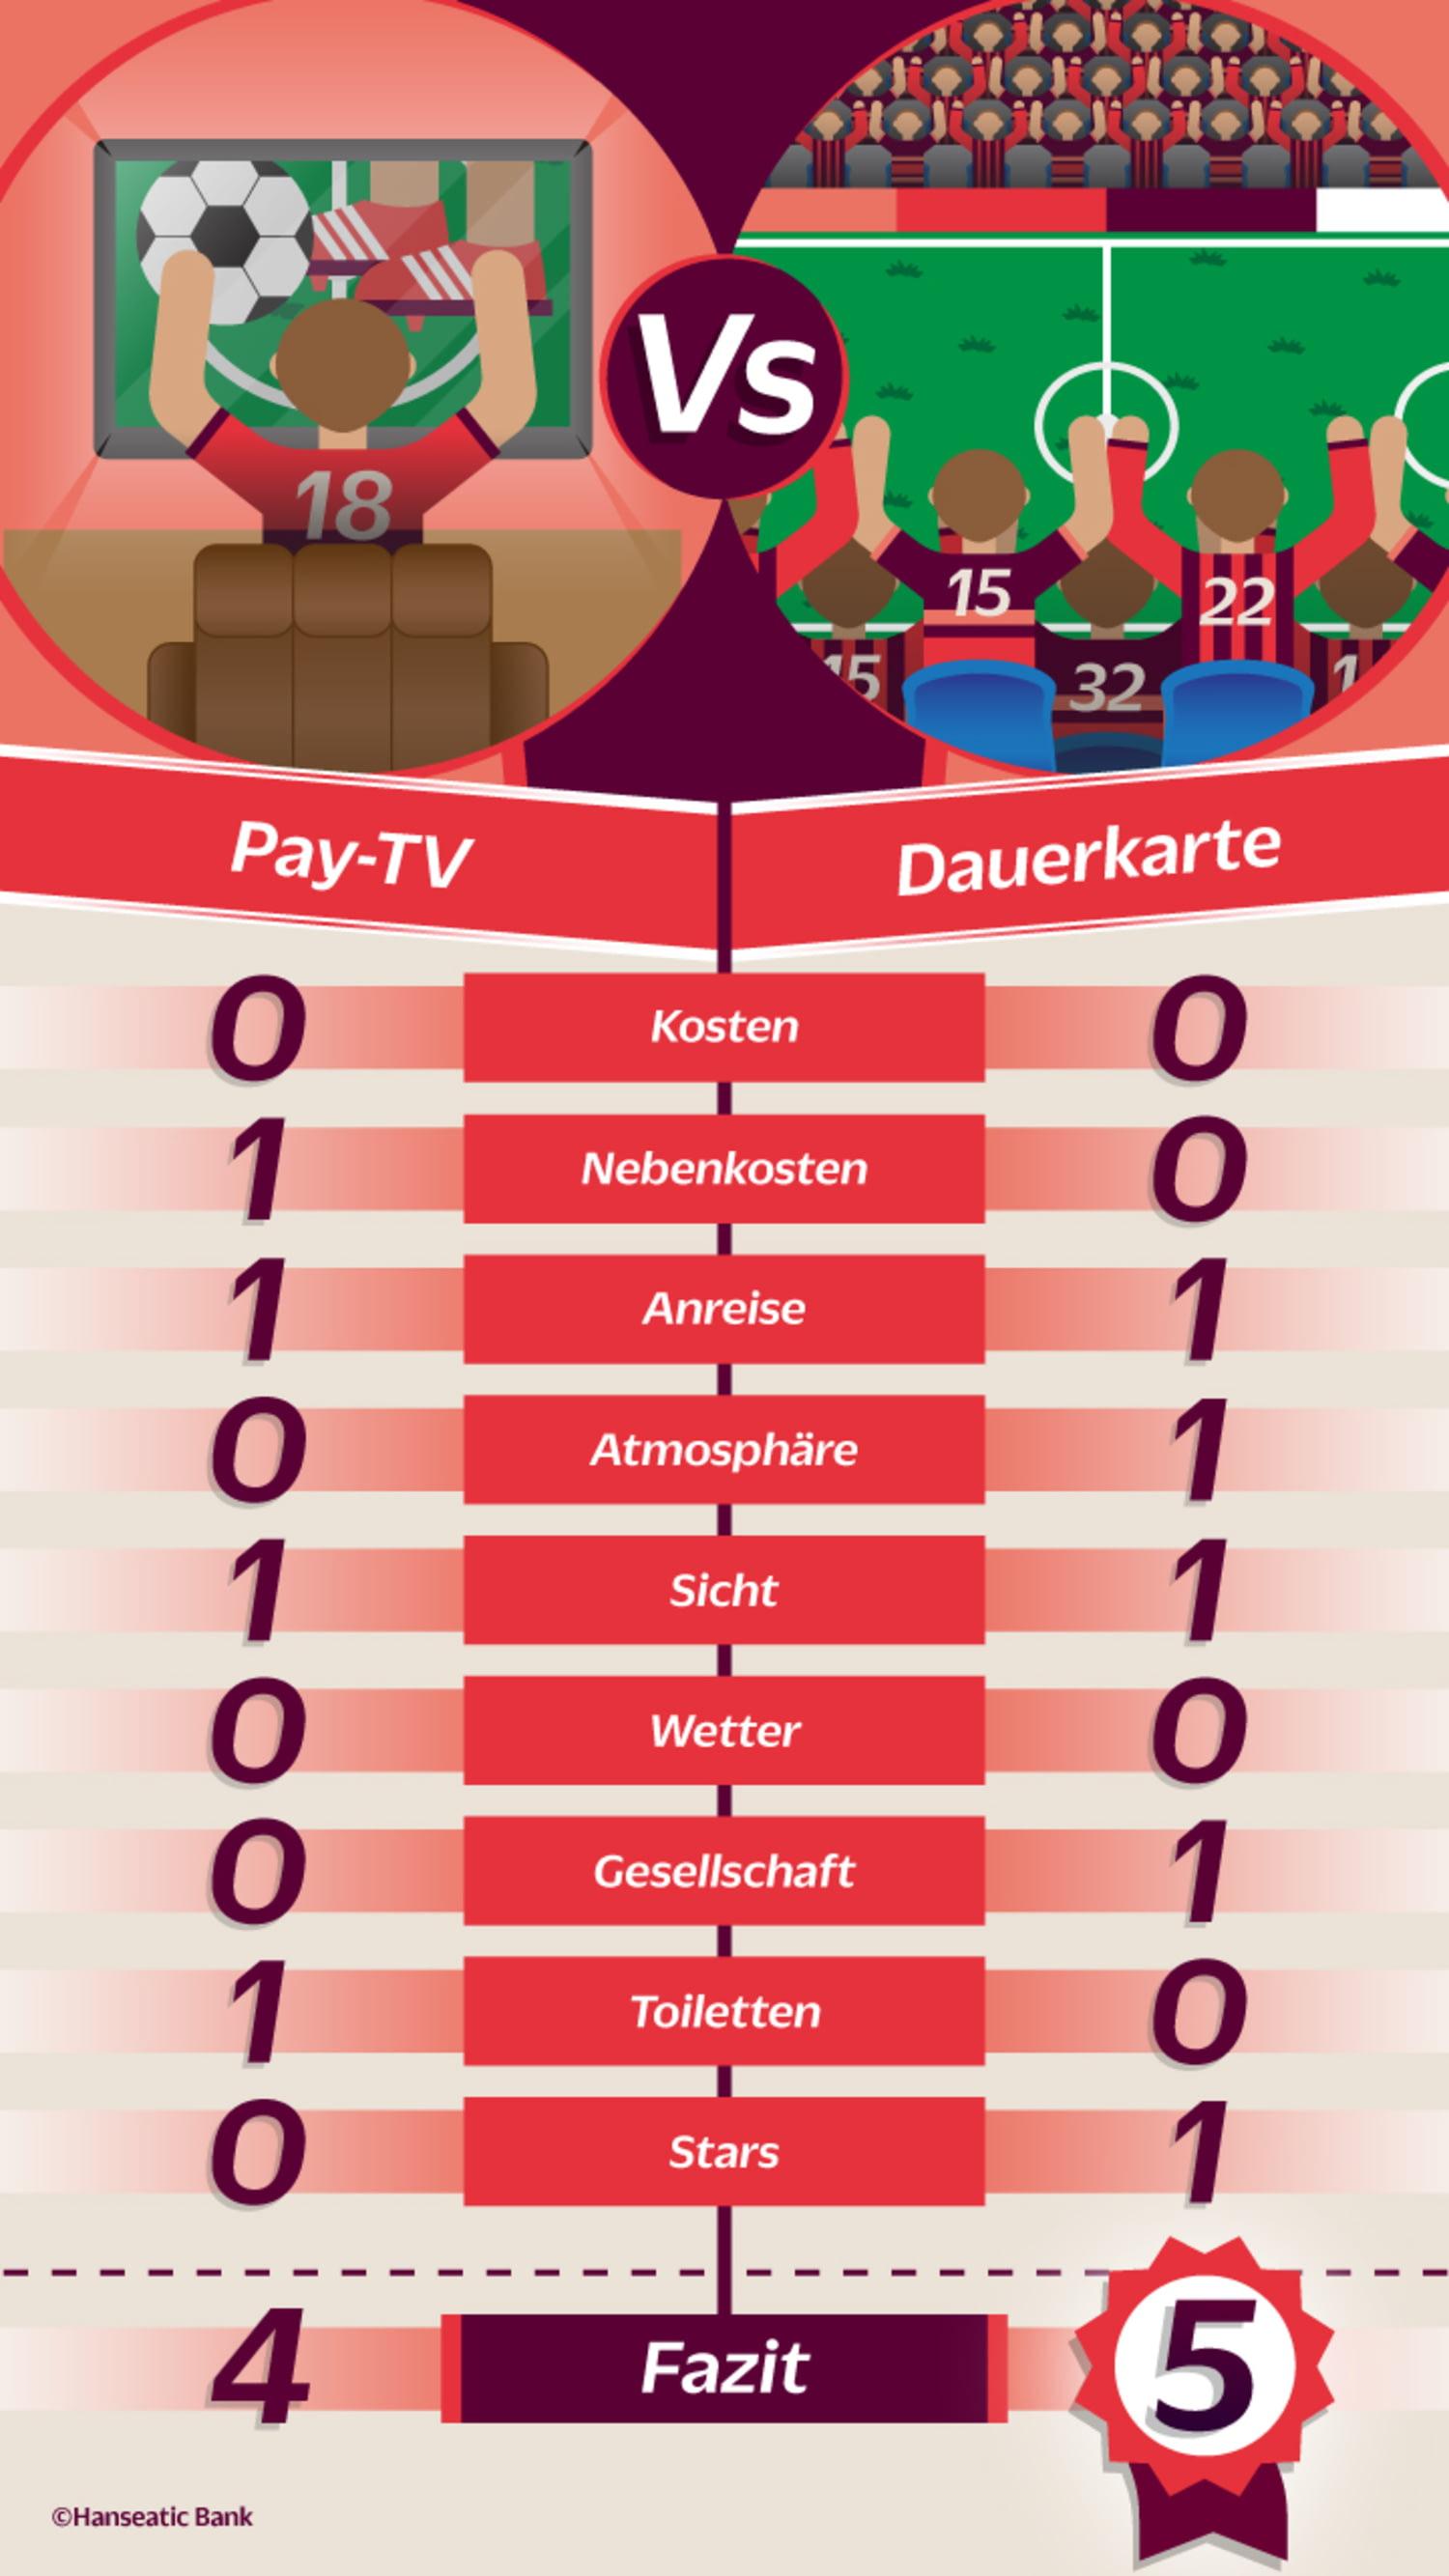 Grafik Vergleich Preis-/Leistung Fußball-Dauerkarte gegen Pay-TV-Abonnement